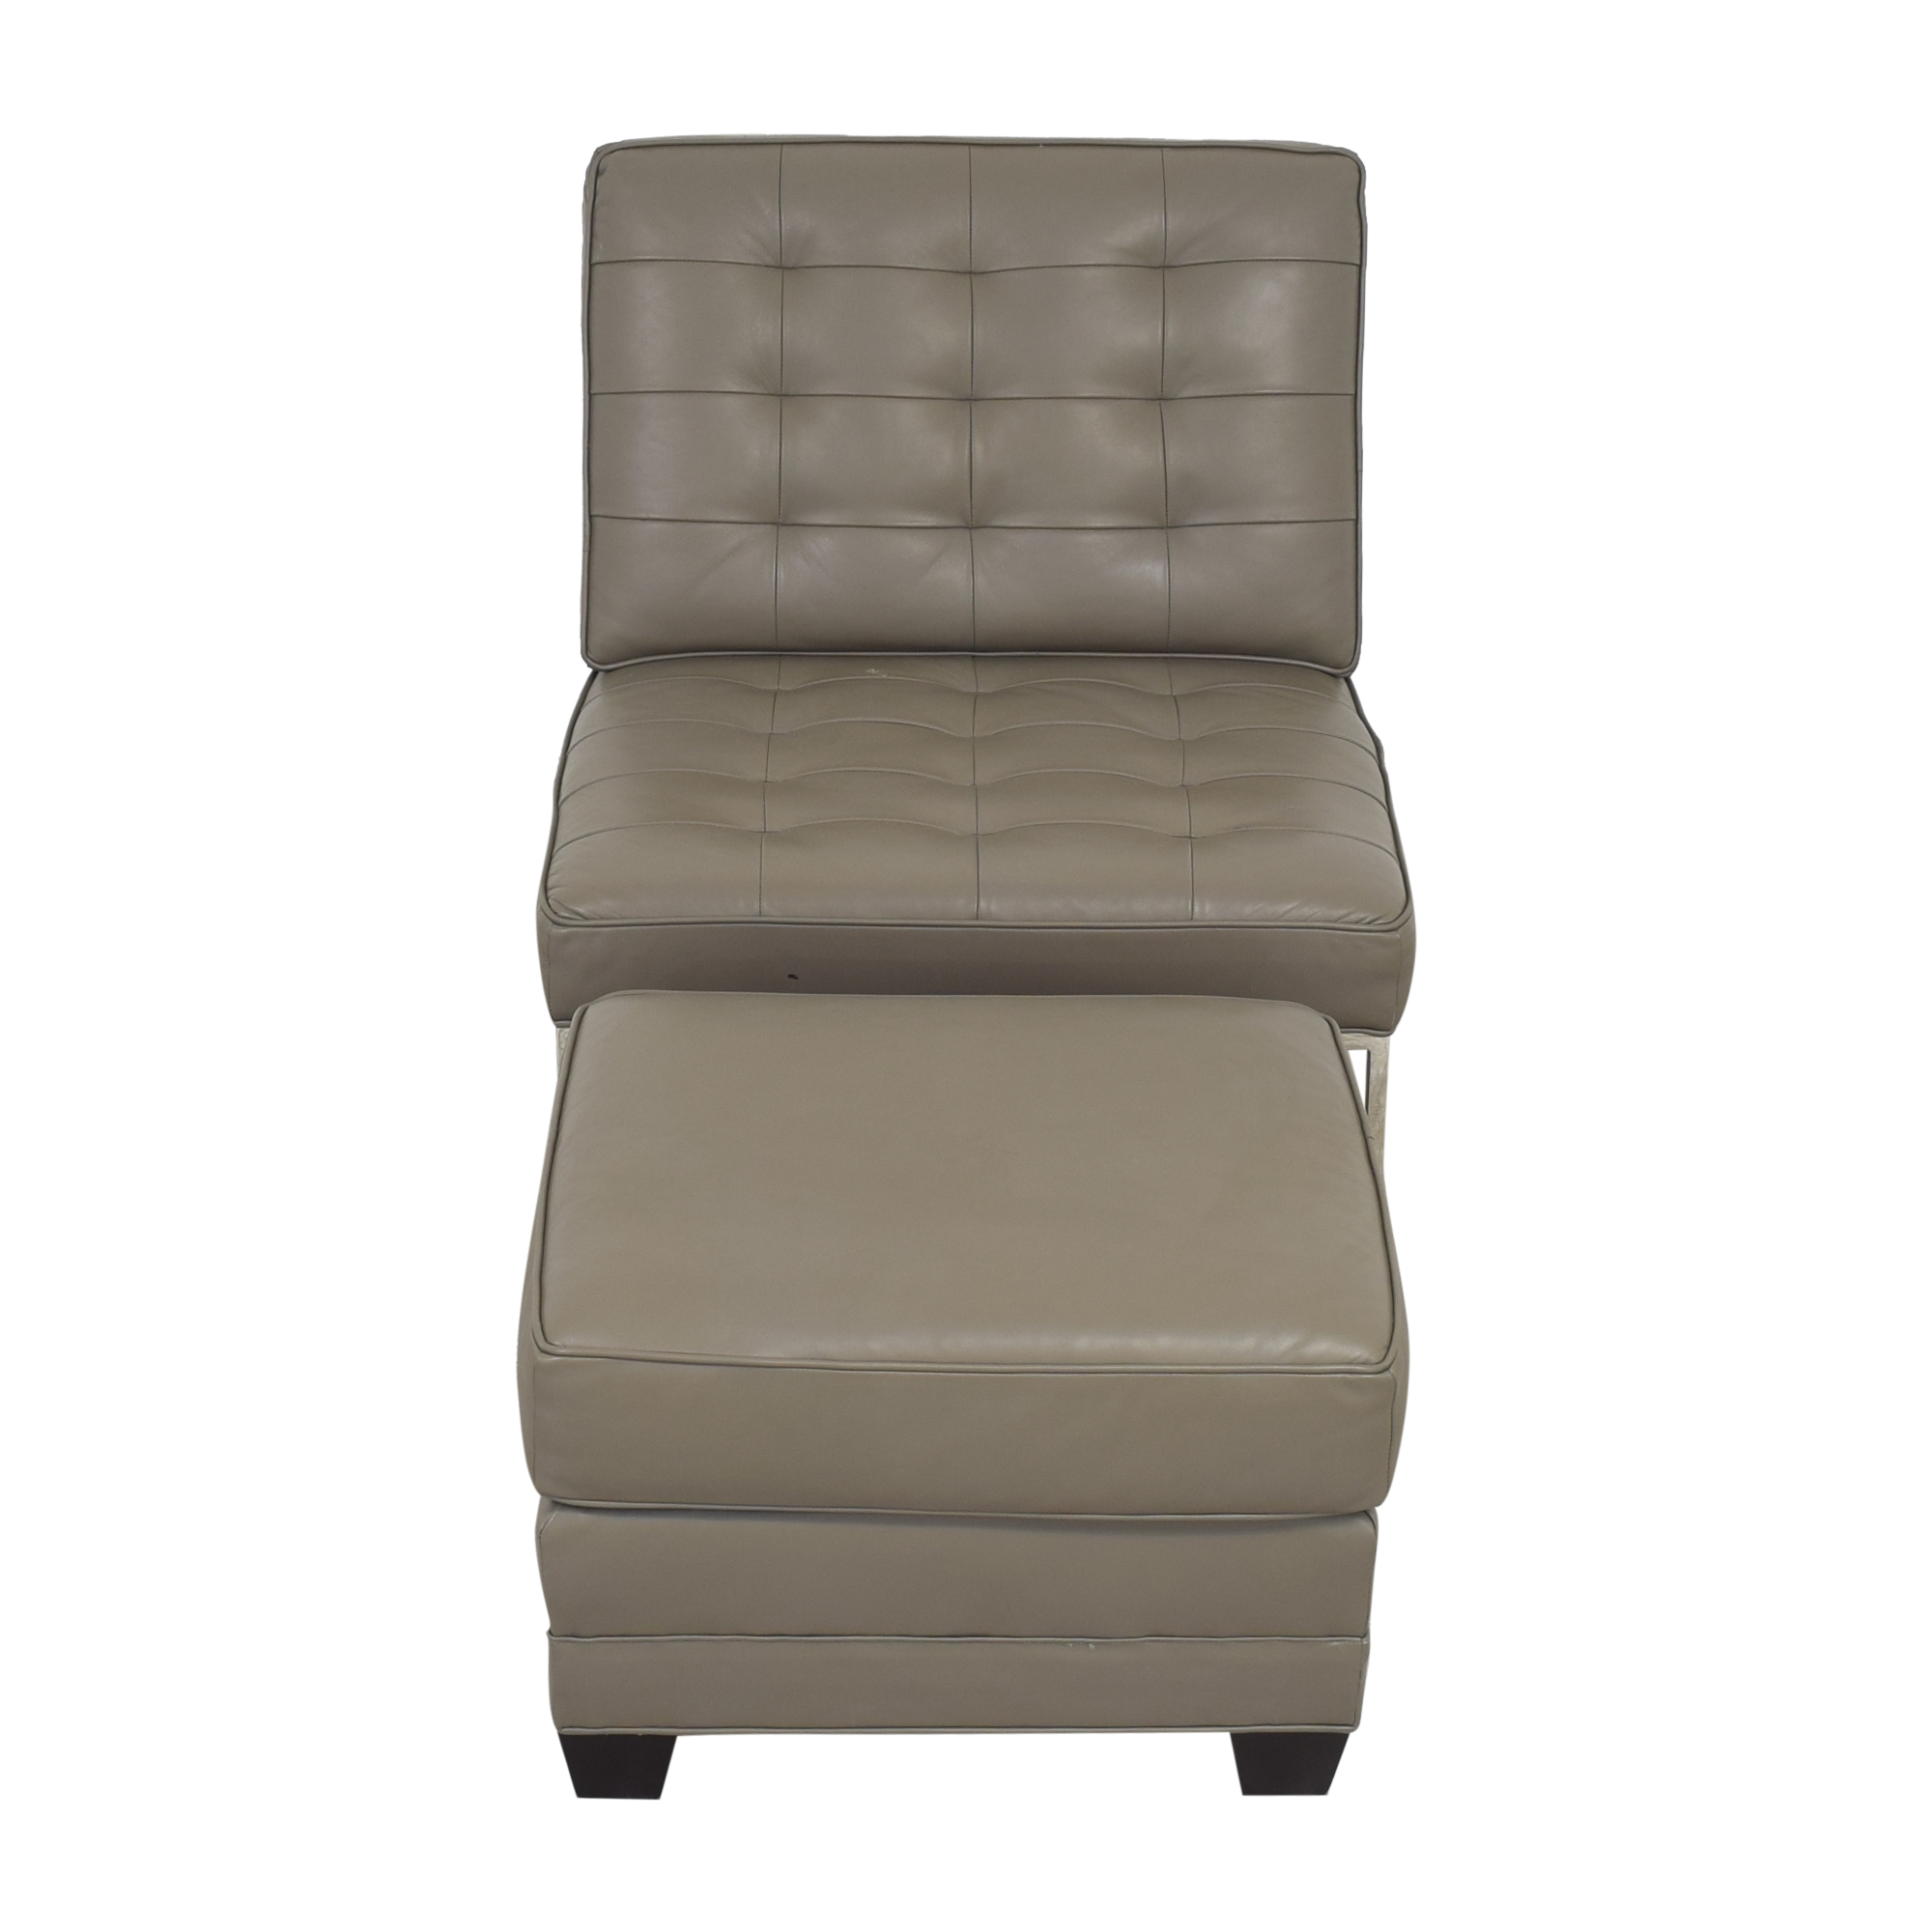 shop Mitchell Gold + Bob Williams Major Chair & Ottoman Mitchell Gold + Bob Williams Chairs